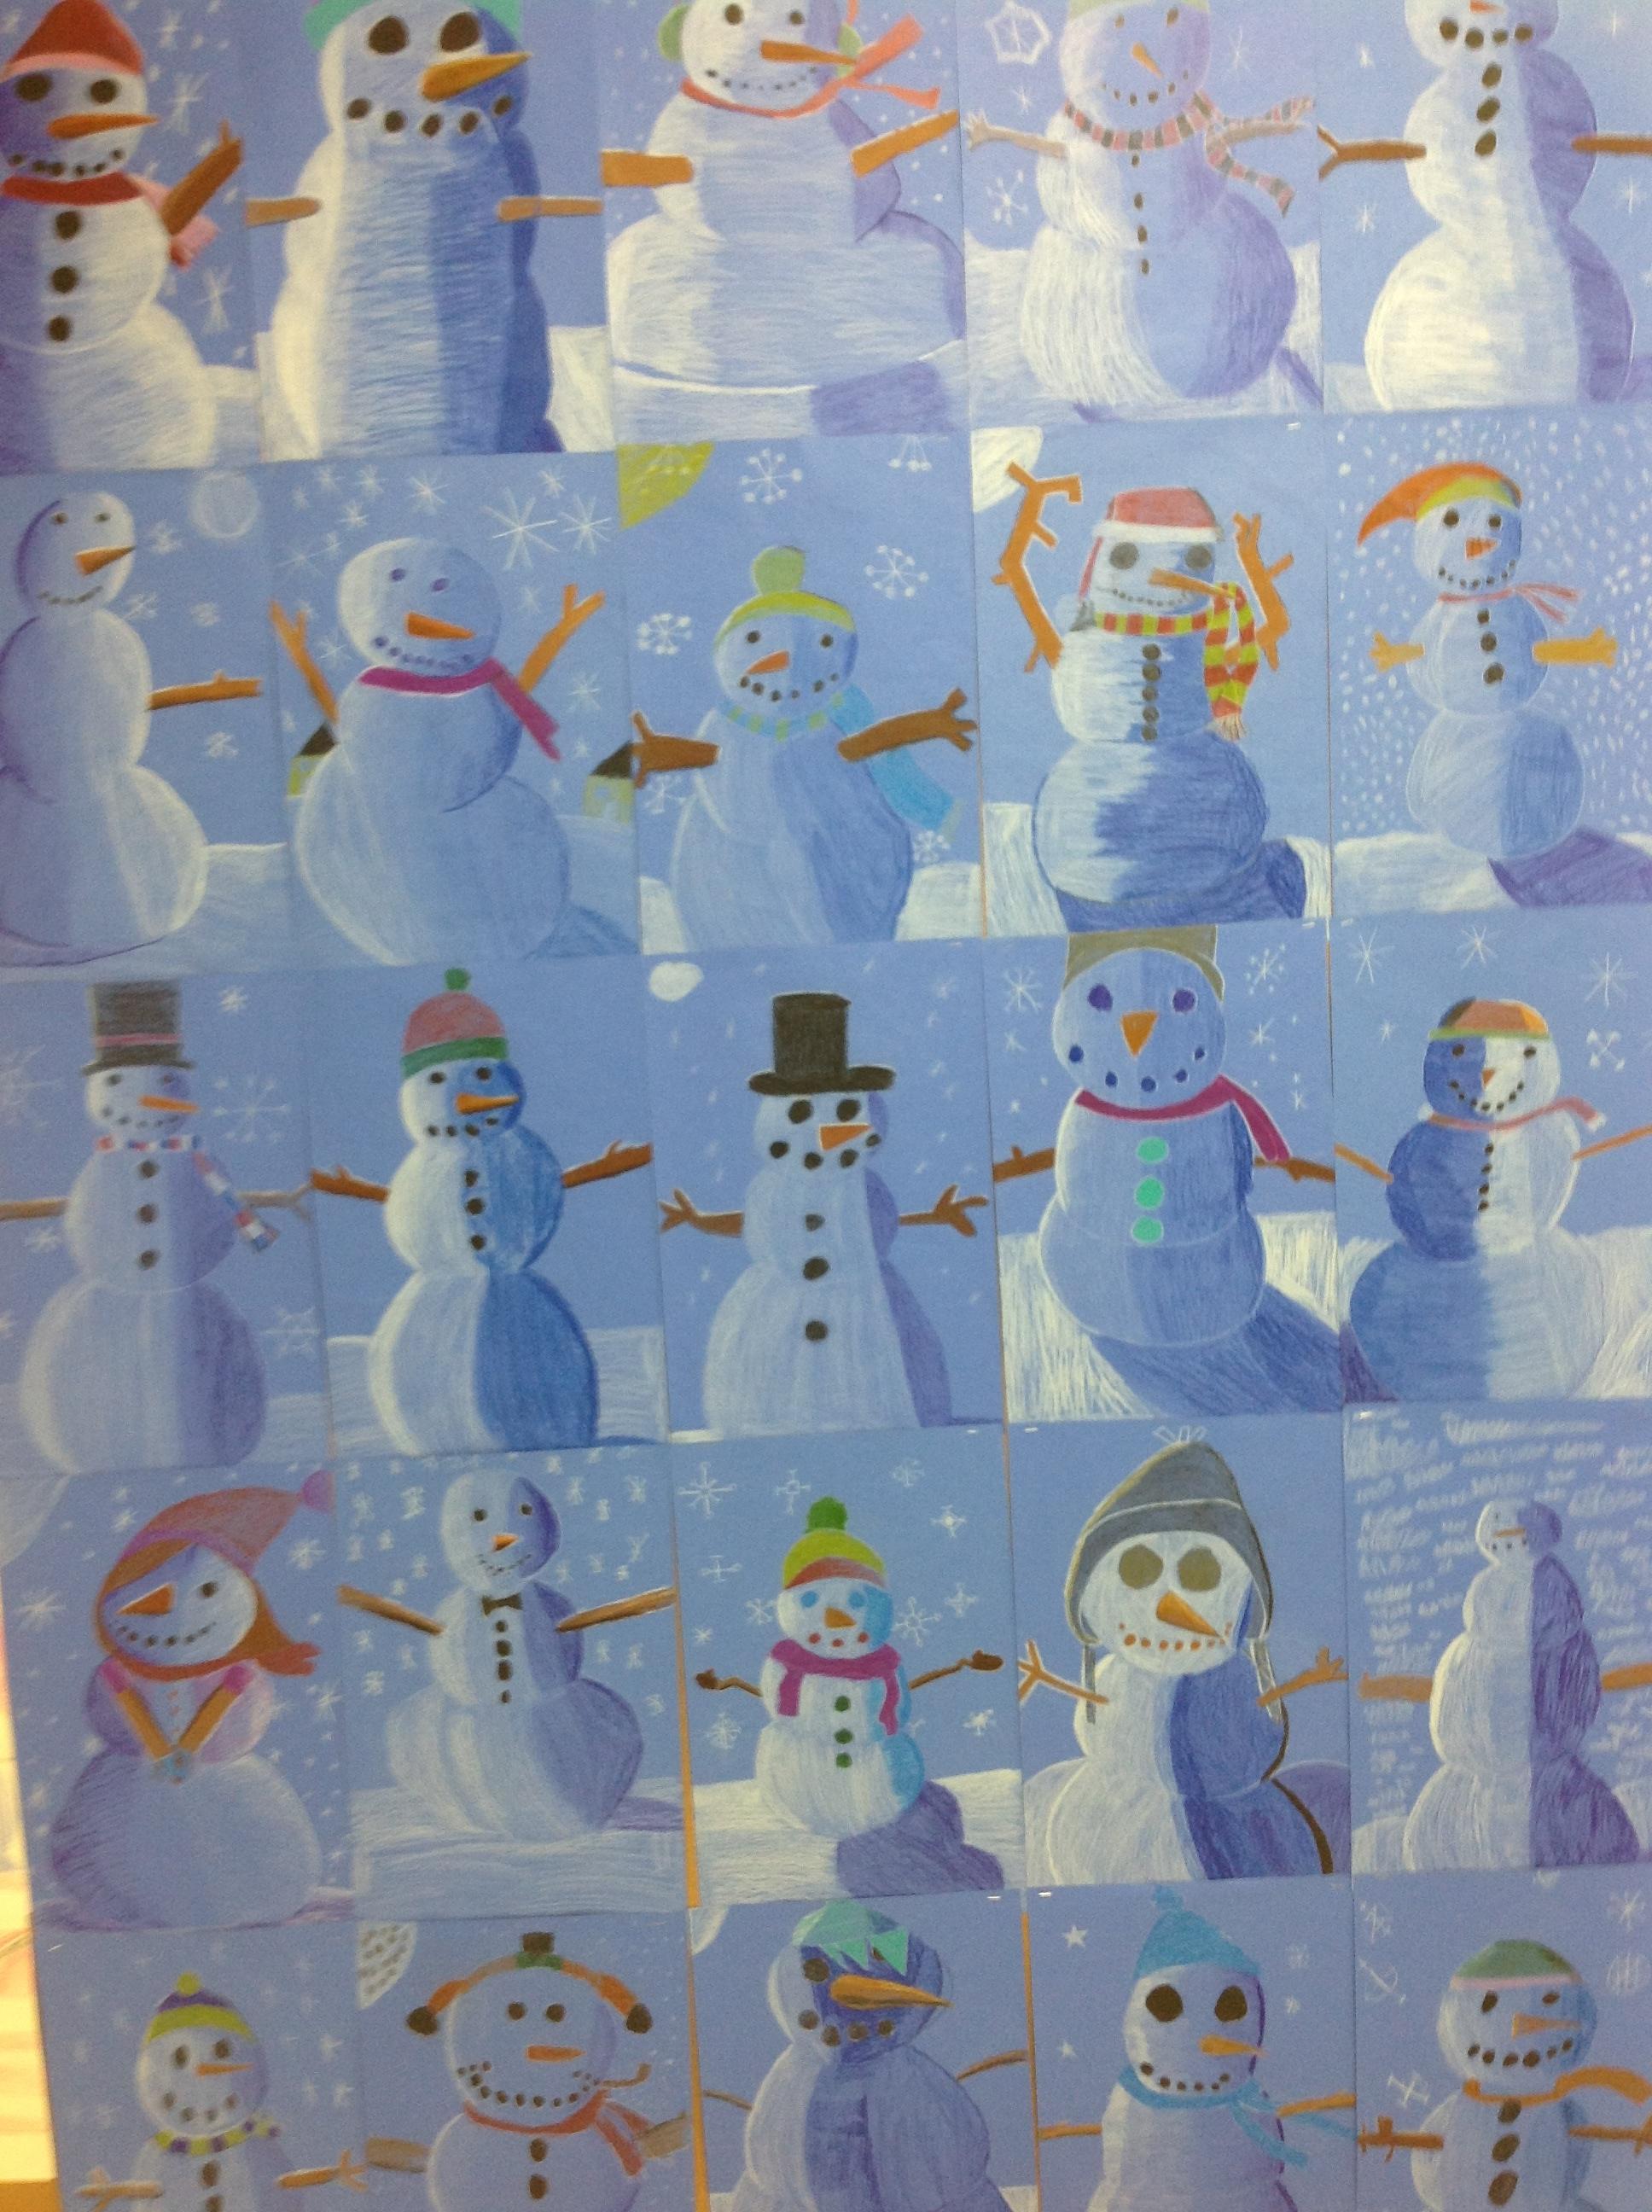 Snowmen Snowmen Everywhere Mrs Yang S Art Room